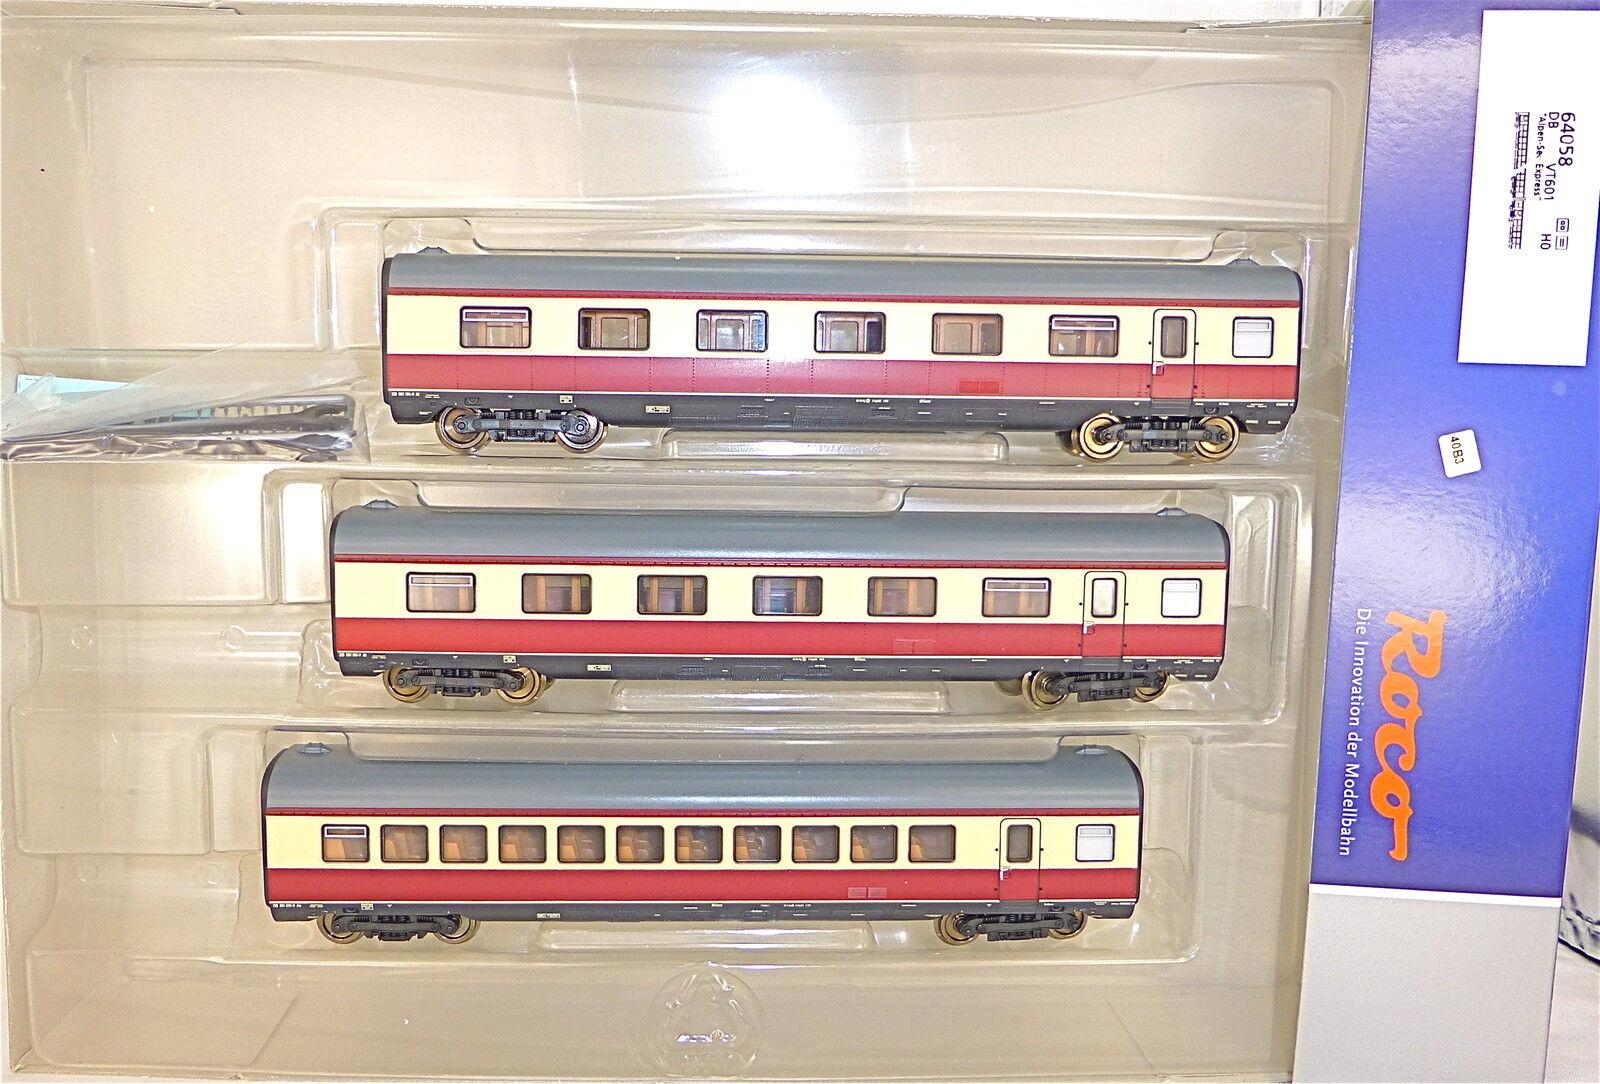 3 Vagone Aggiuntivo Alpi See Express Br 601 VT 11 5 Tee DB Roco 64058 Dcl Μ